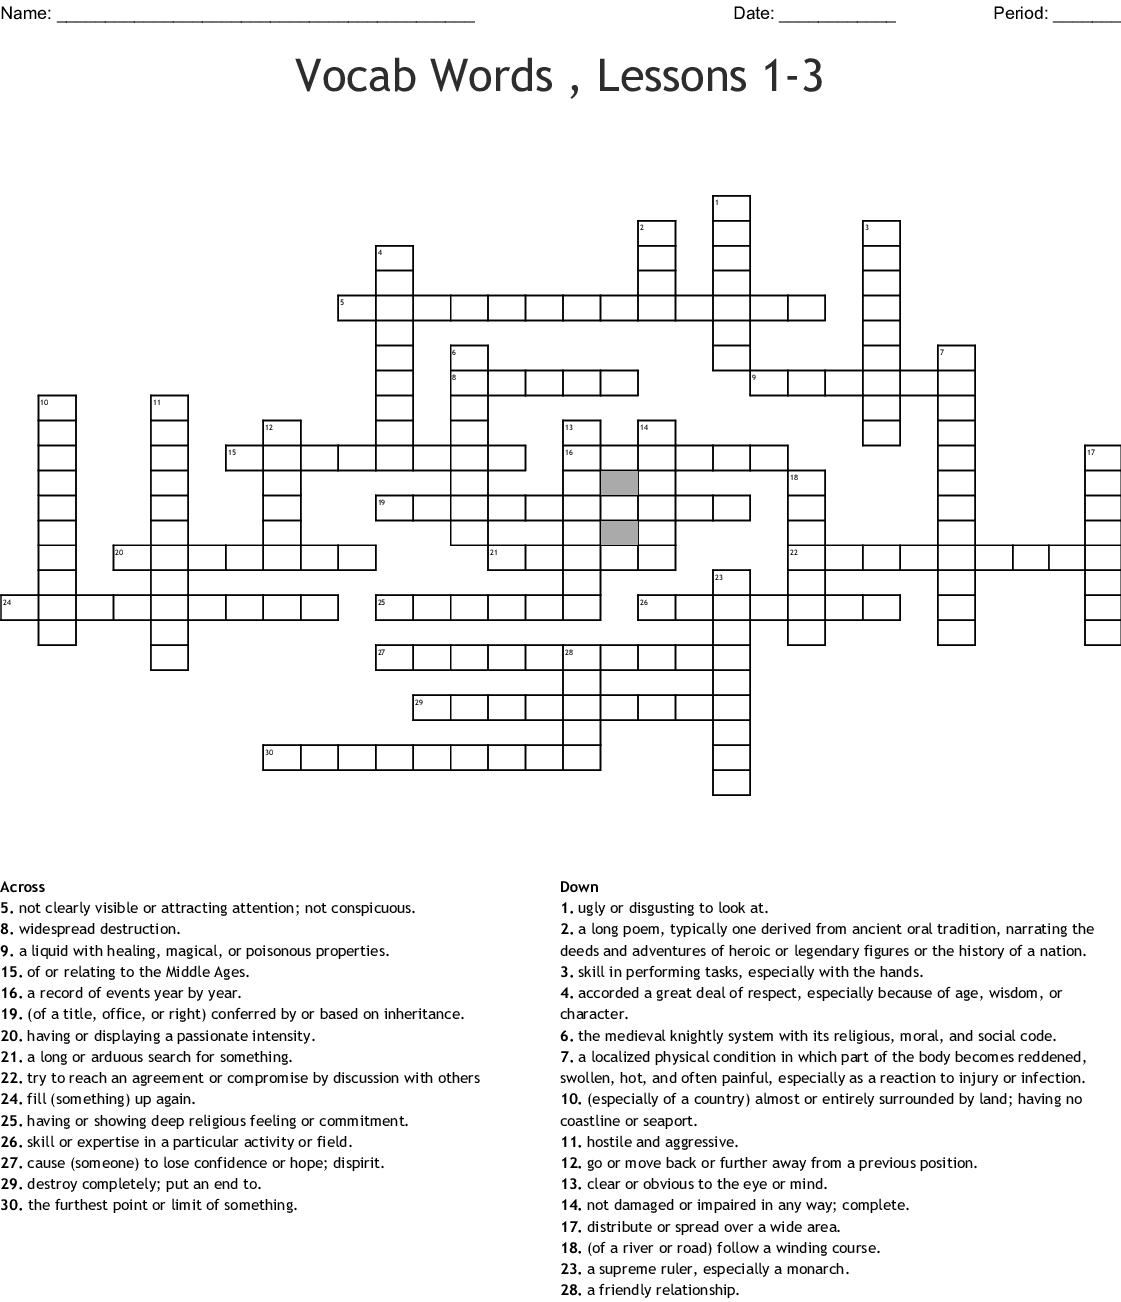 Vocab Words Lessons 1 3 Crossword